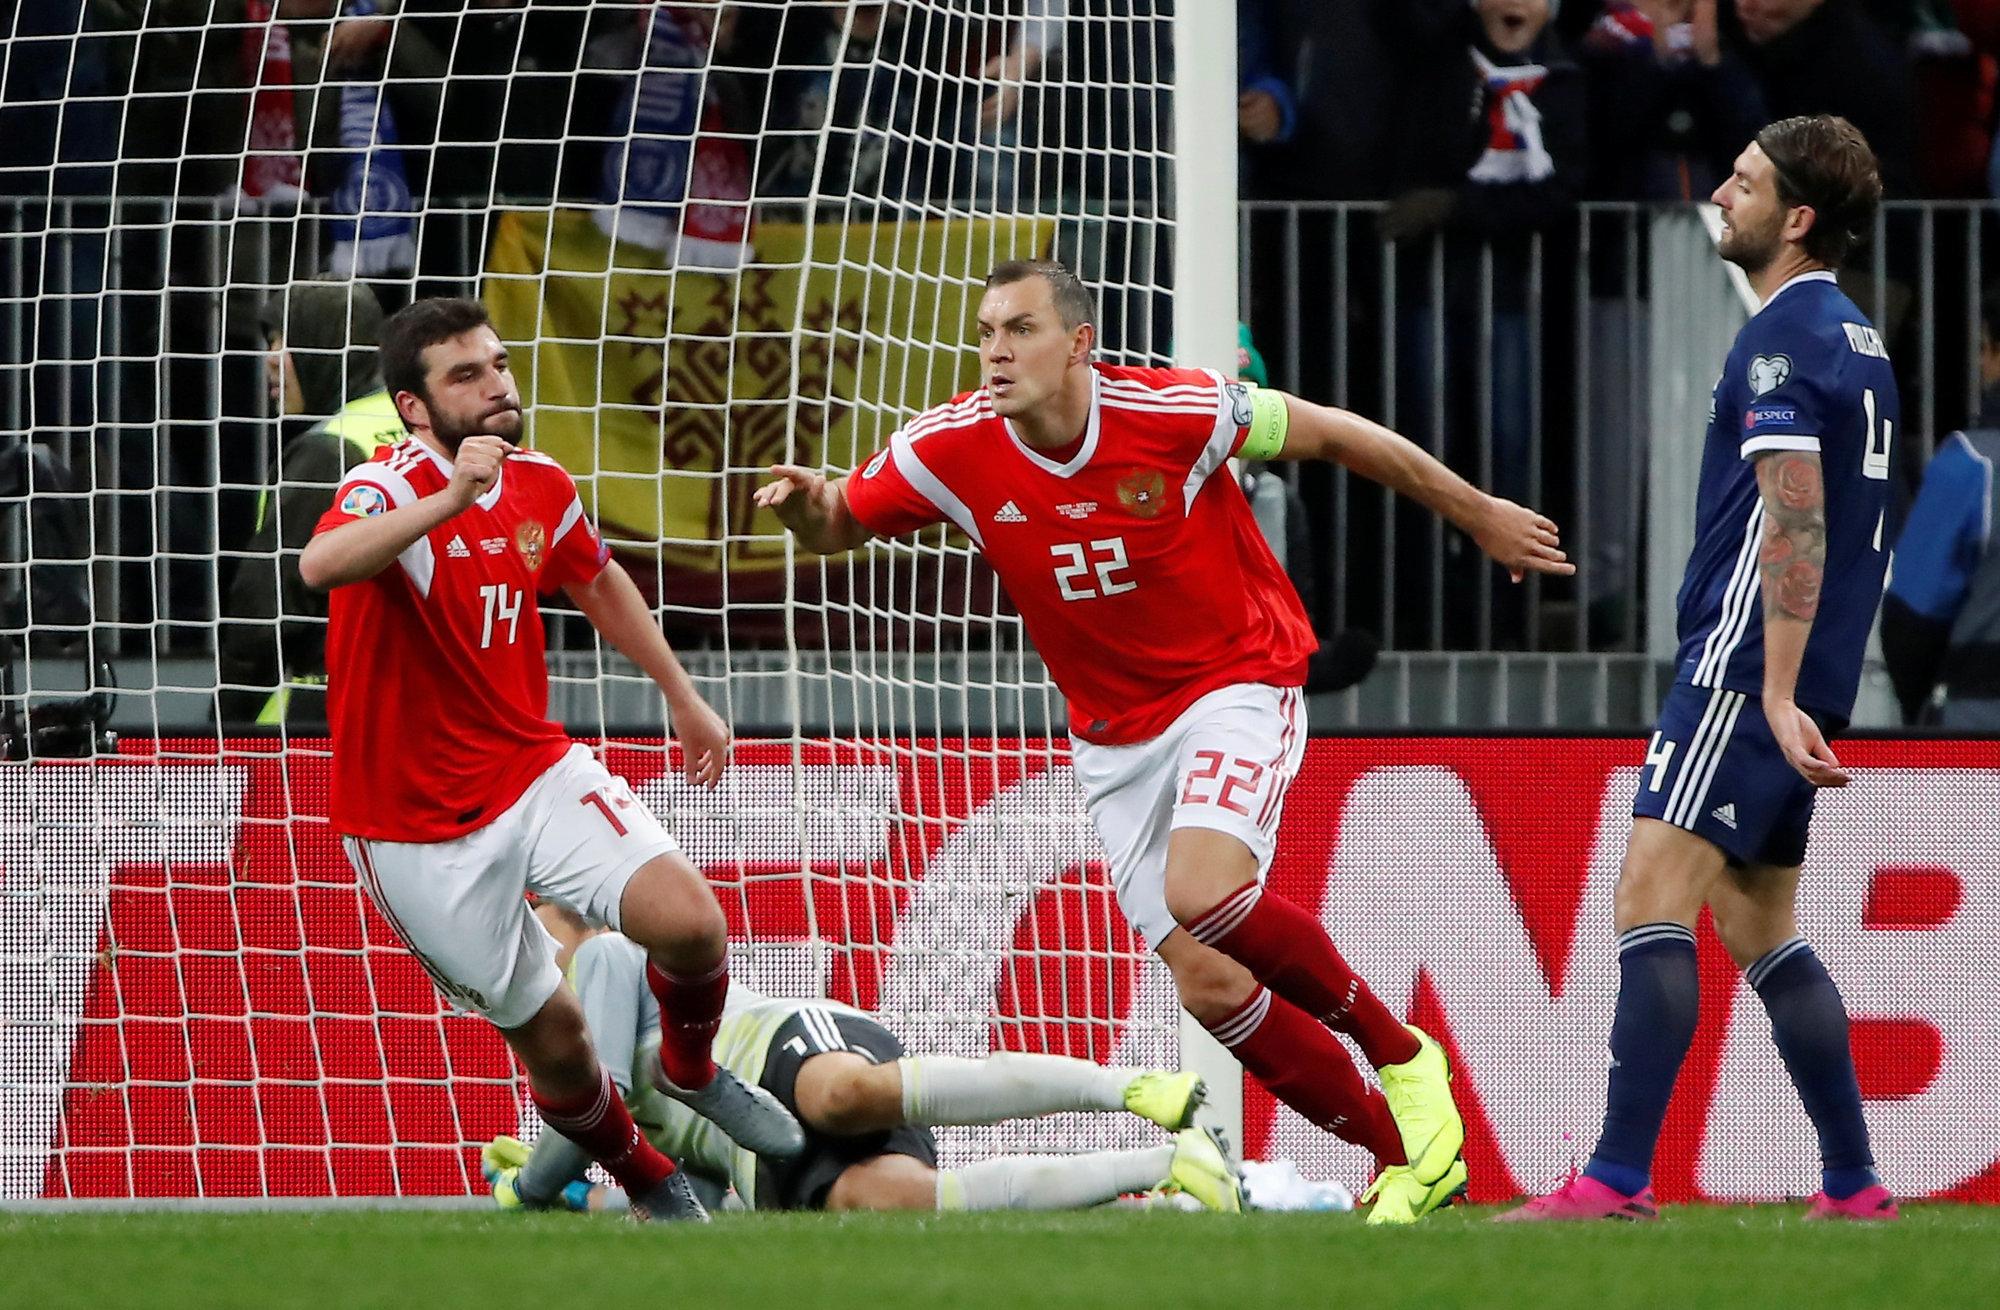 Смотреть футбол англия италия на спортбоксе